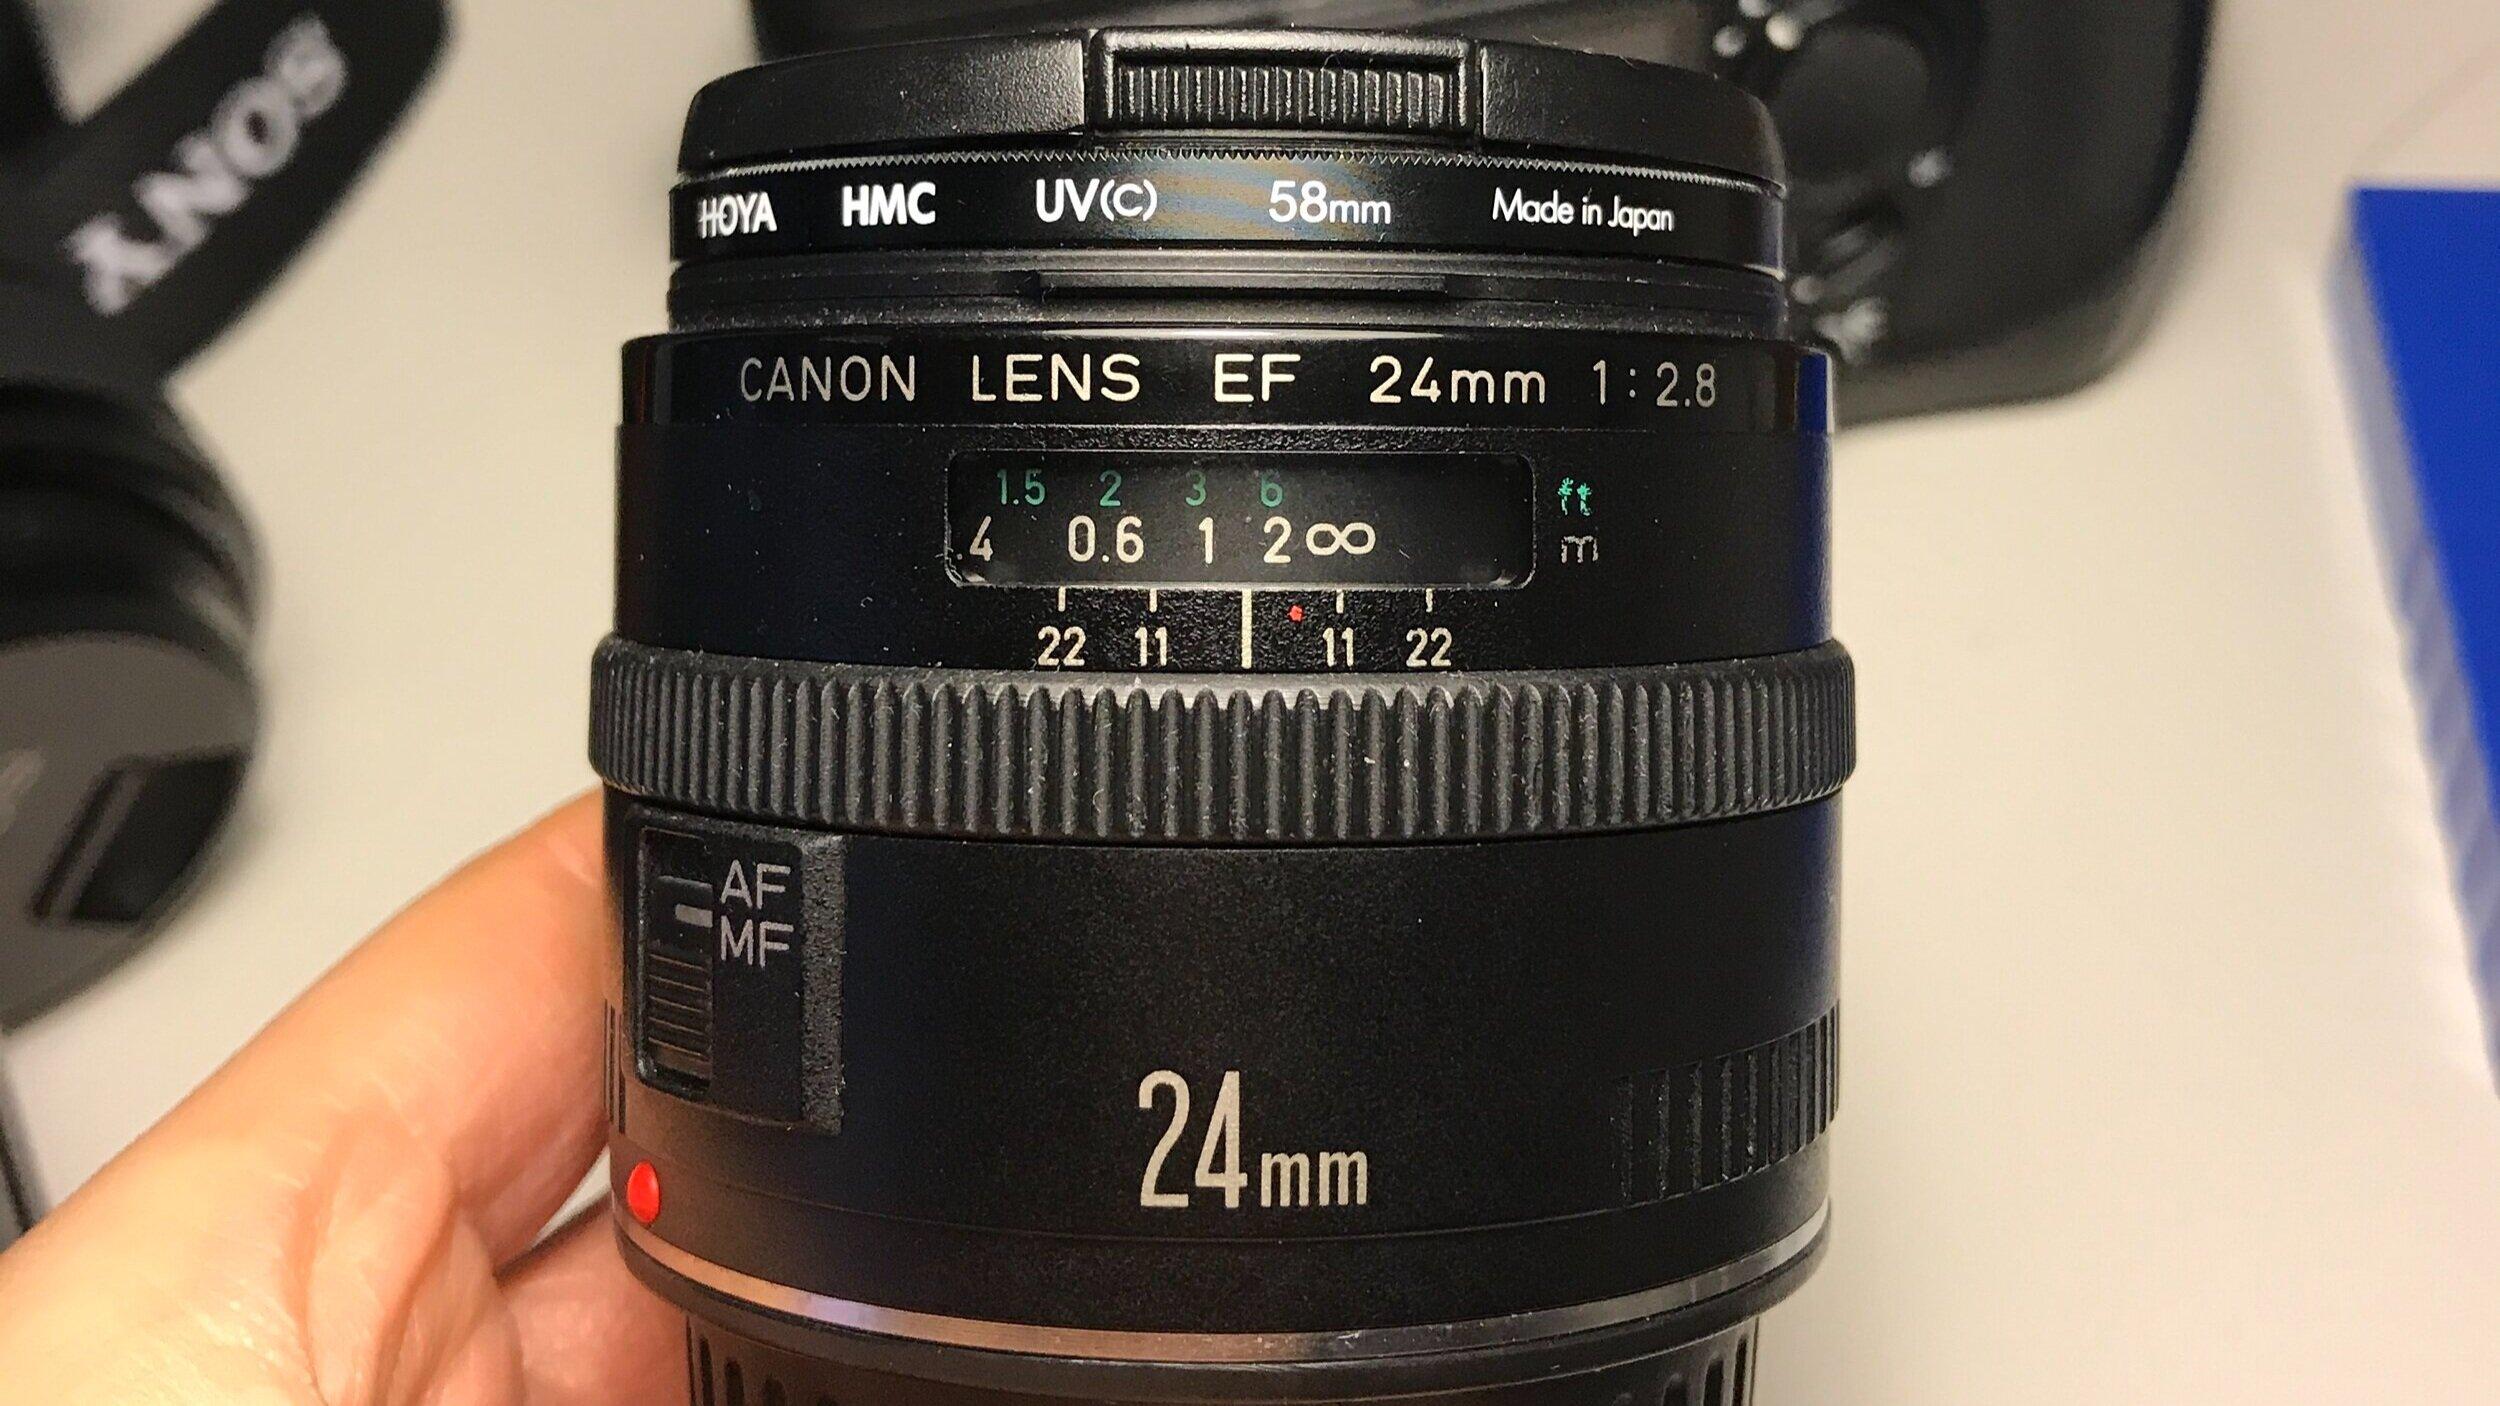 hyperfocal distance street photography 24mm prime lens